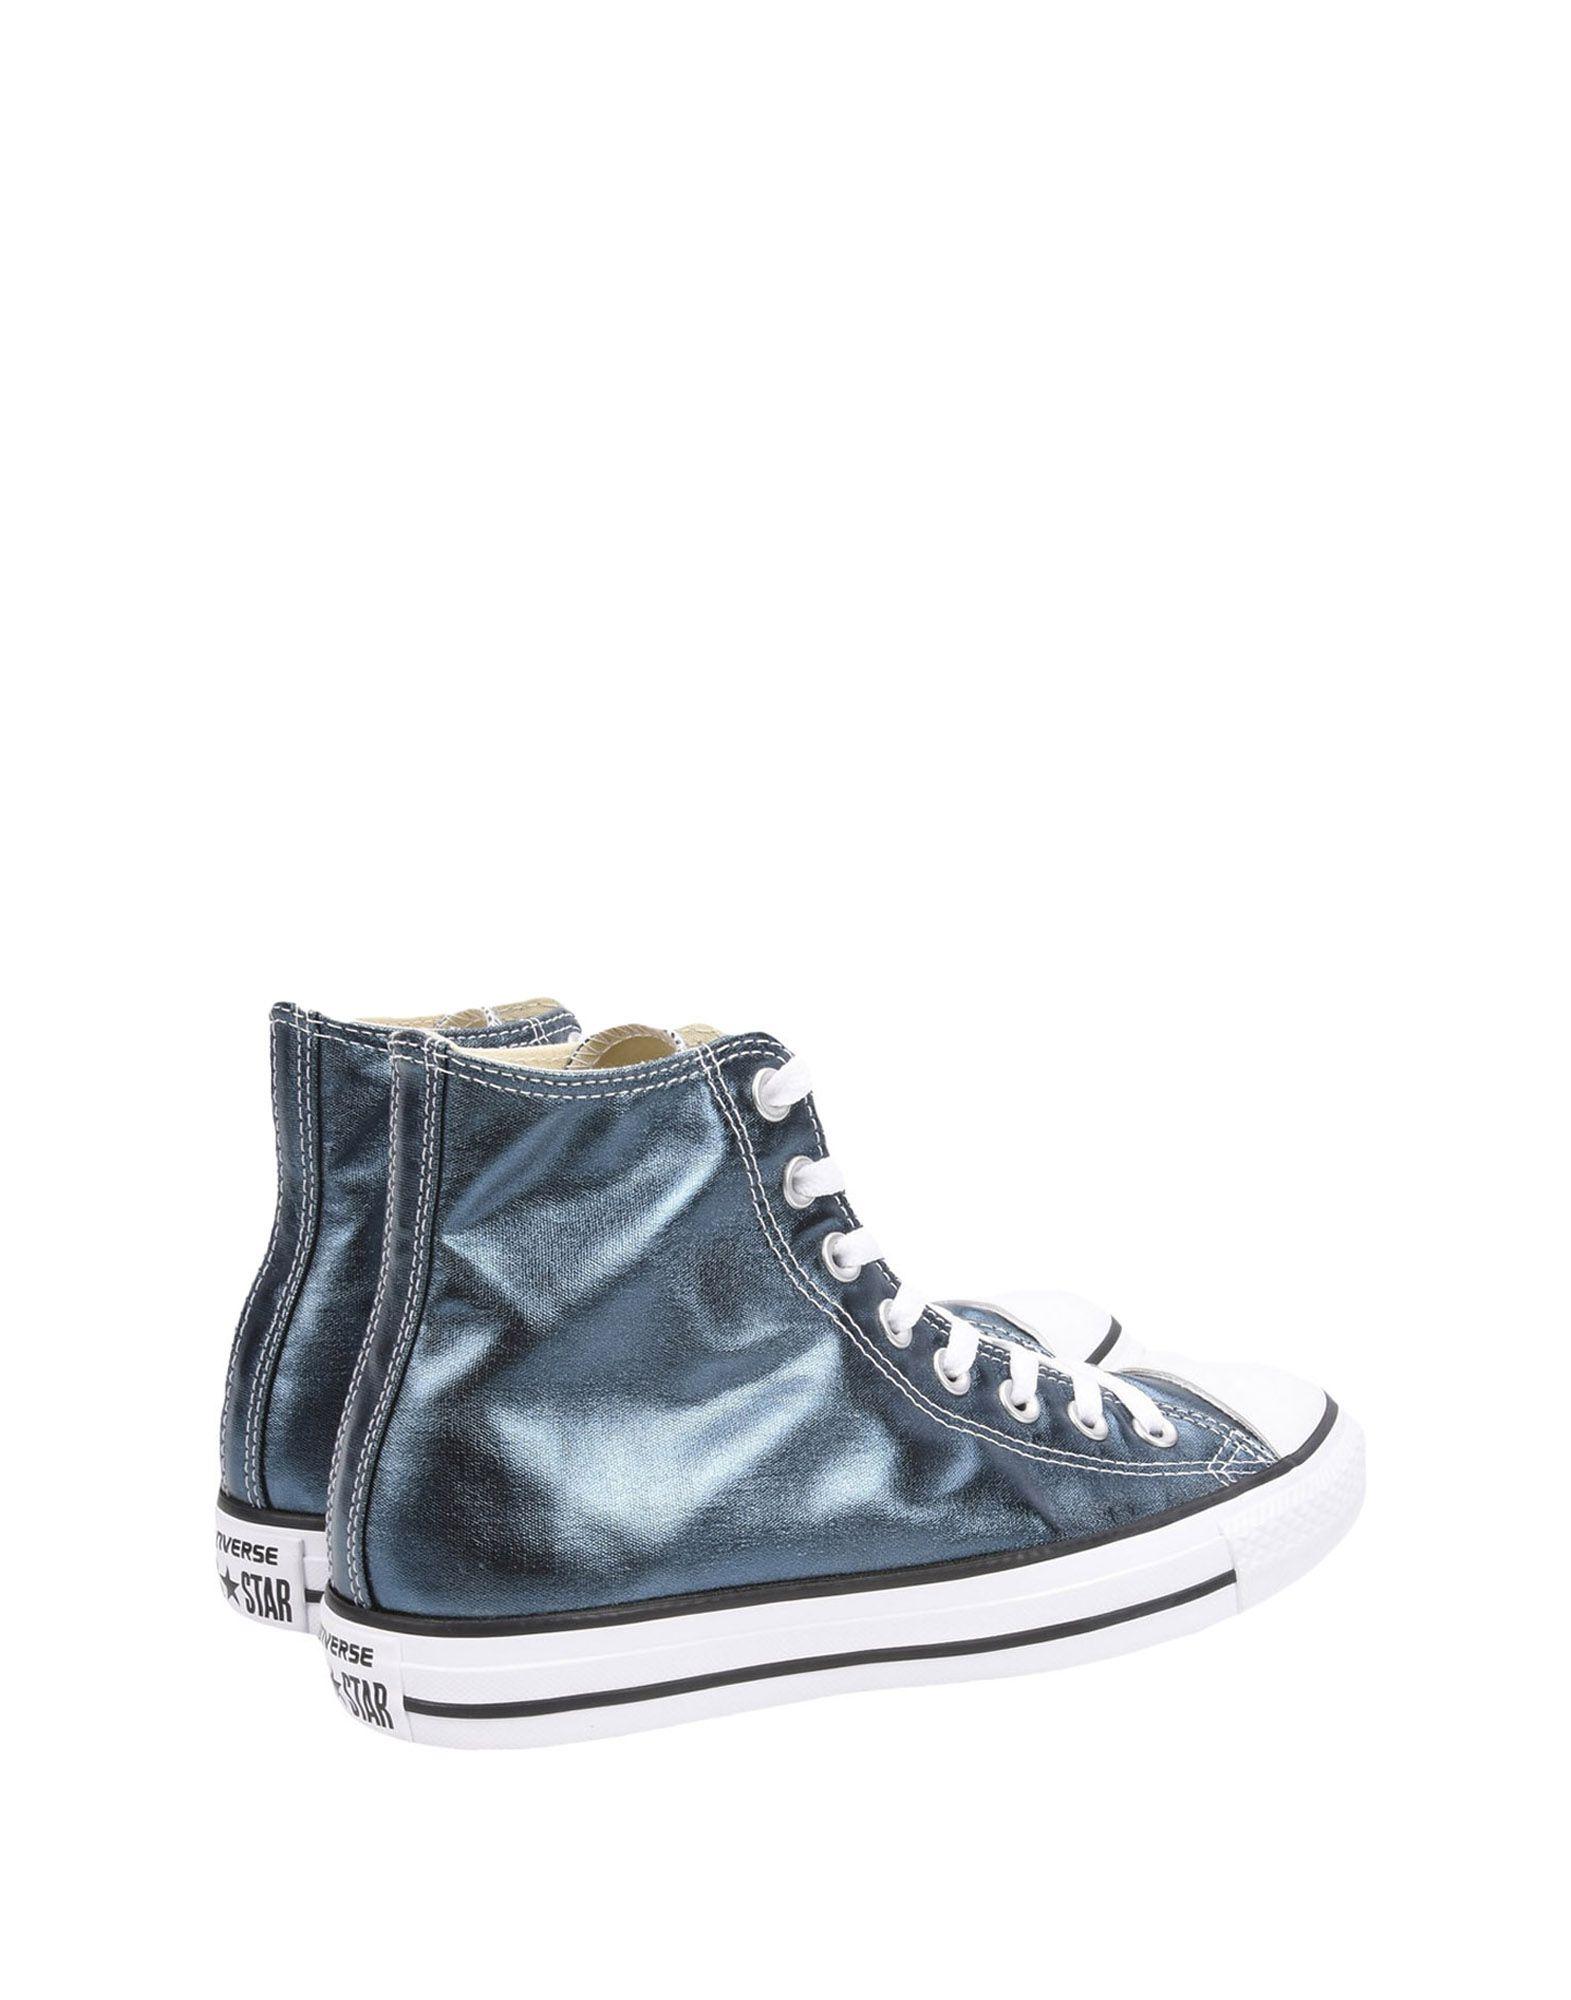 Converse All Star Ct As Hi Canvas Qualität Metallic  11335820TX Gute Qualität Canvas beliebte Schuhe 82cf30